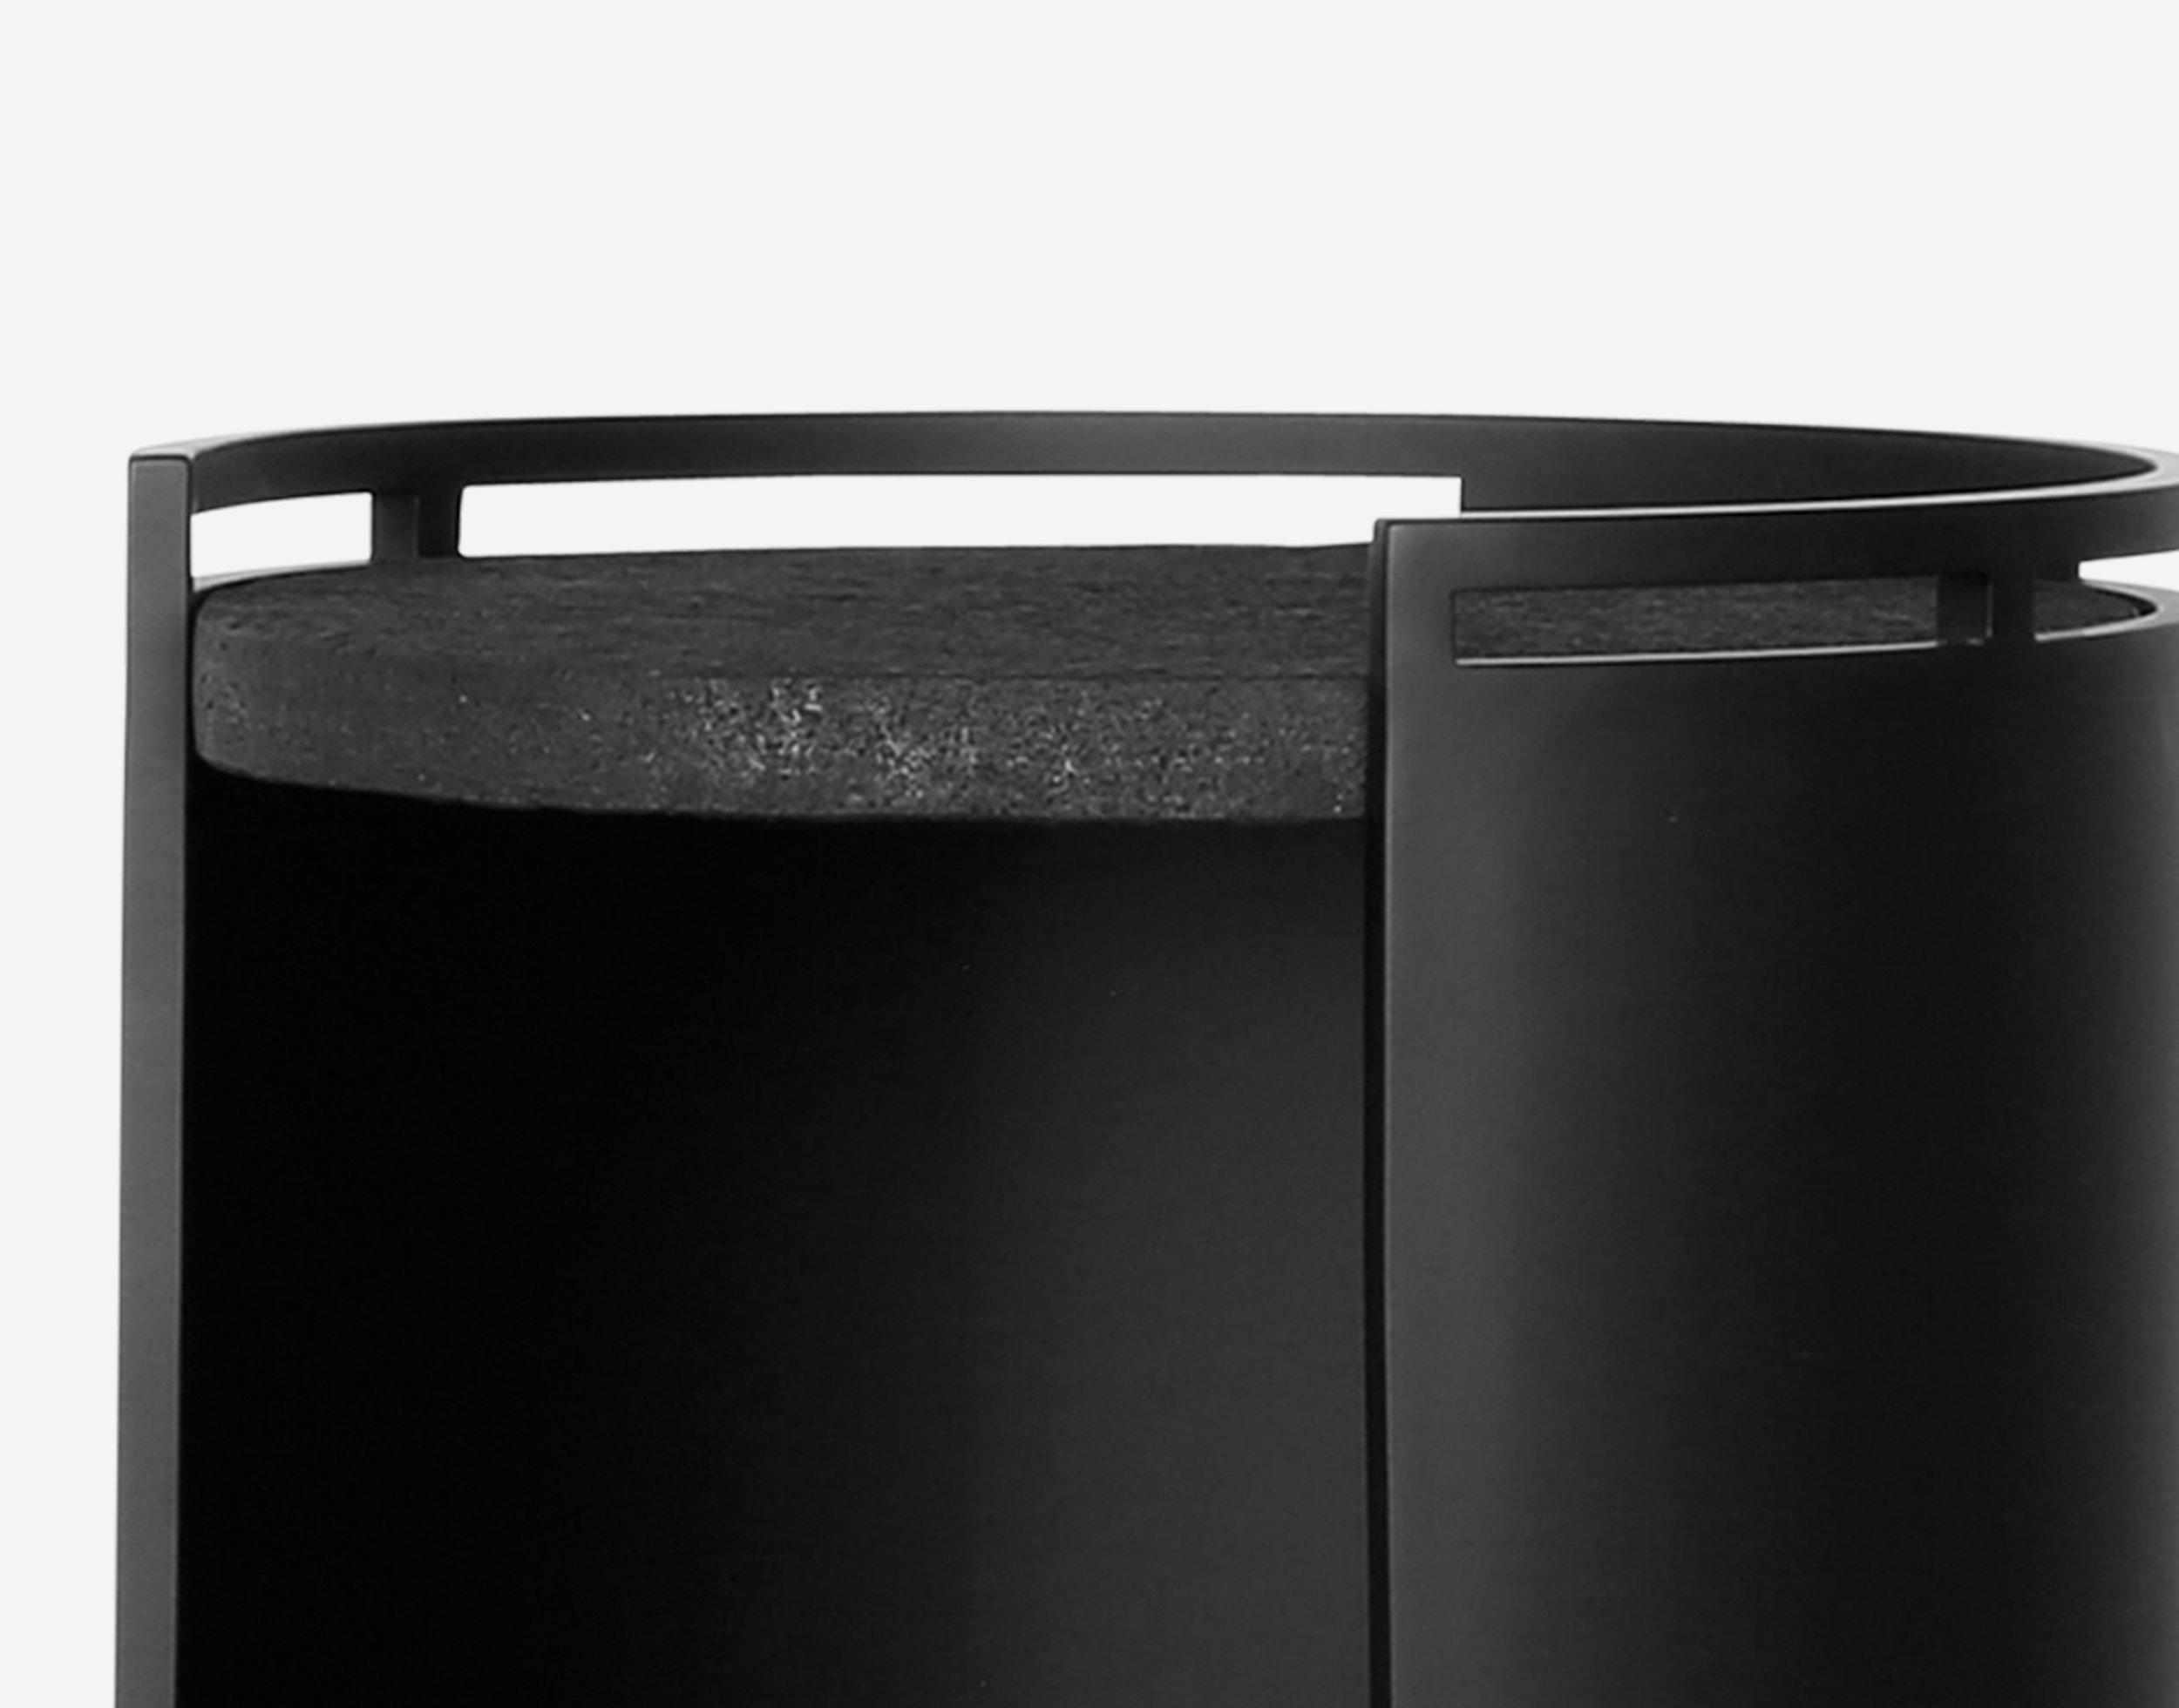 Luteca_JI_Valle-Side-Table_Black-Steel-Volcanic-Stone_D1-W.jpg